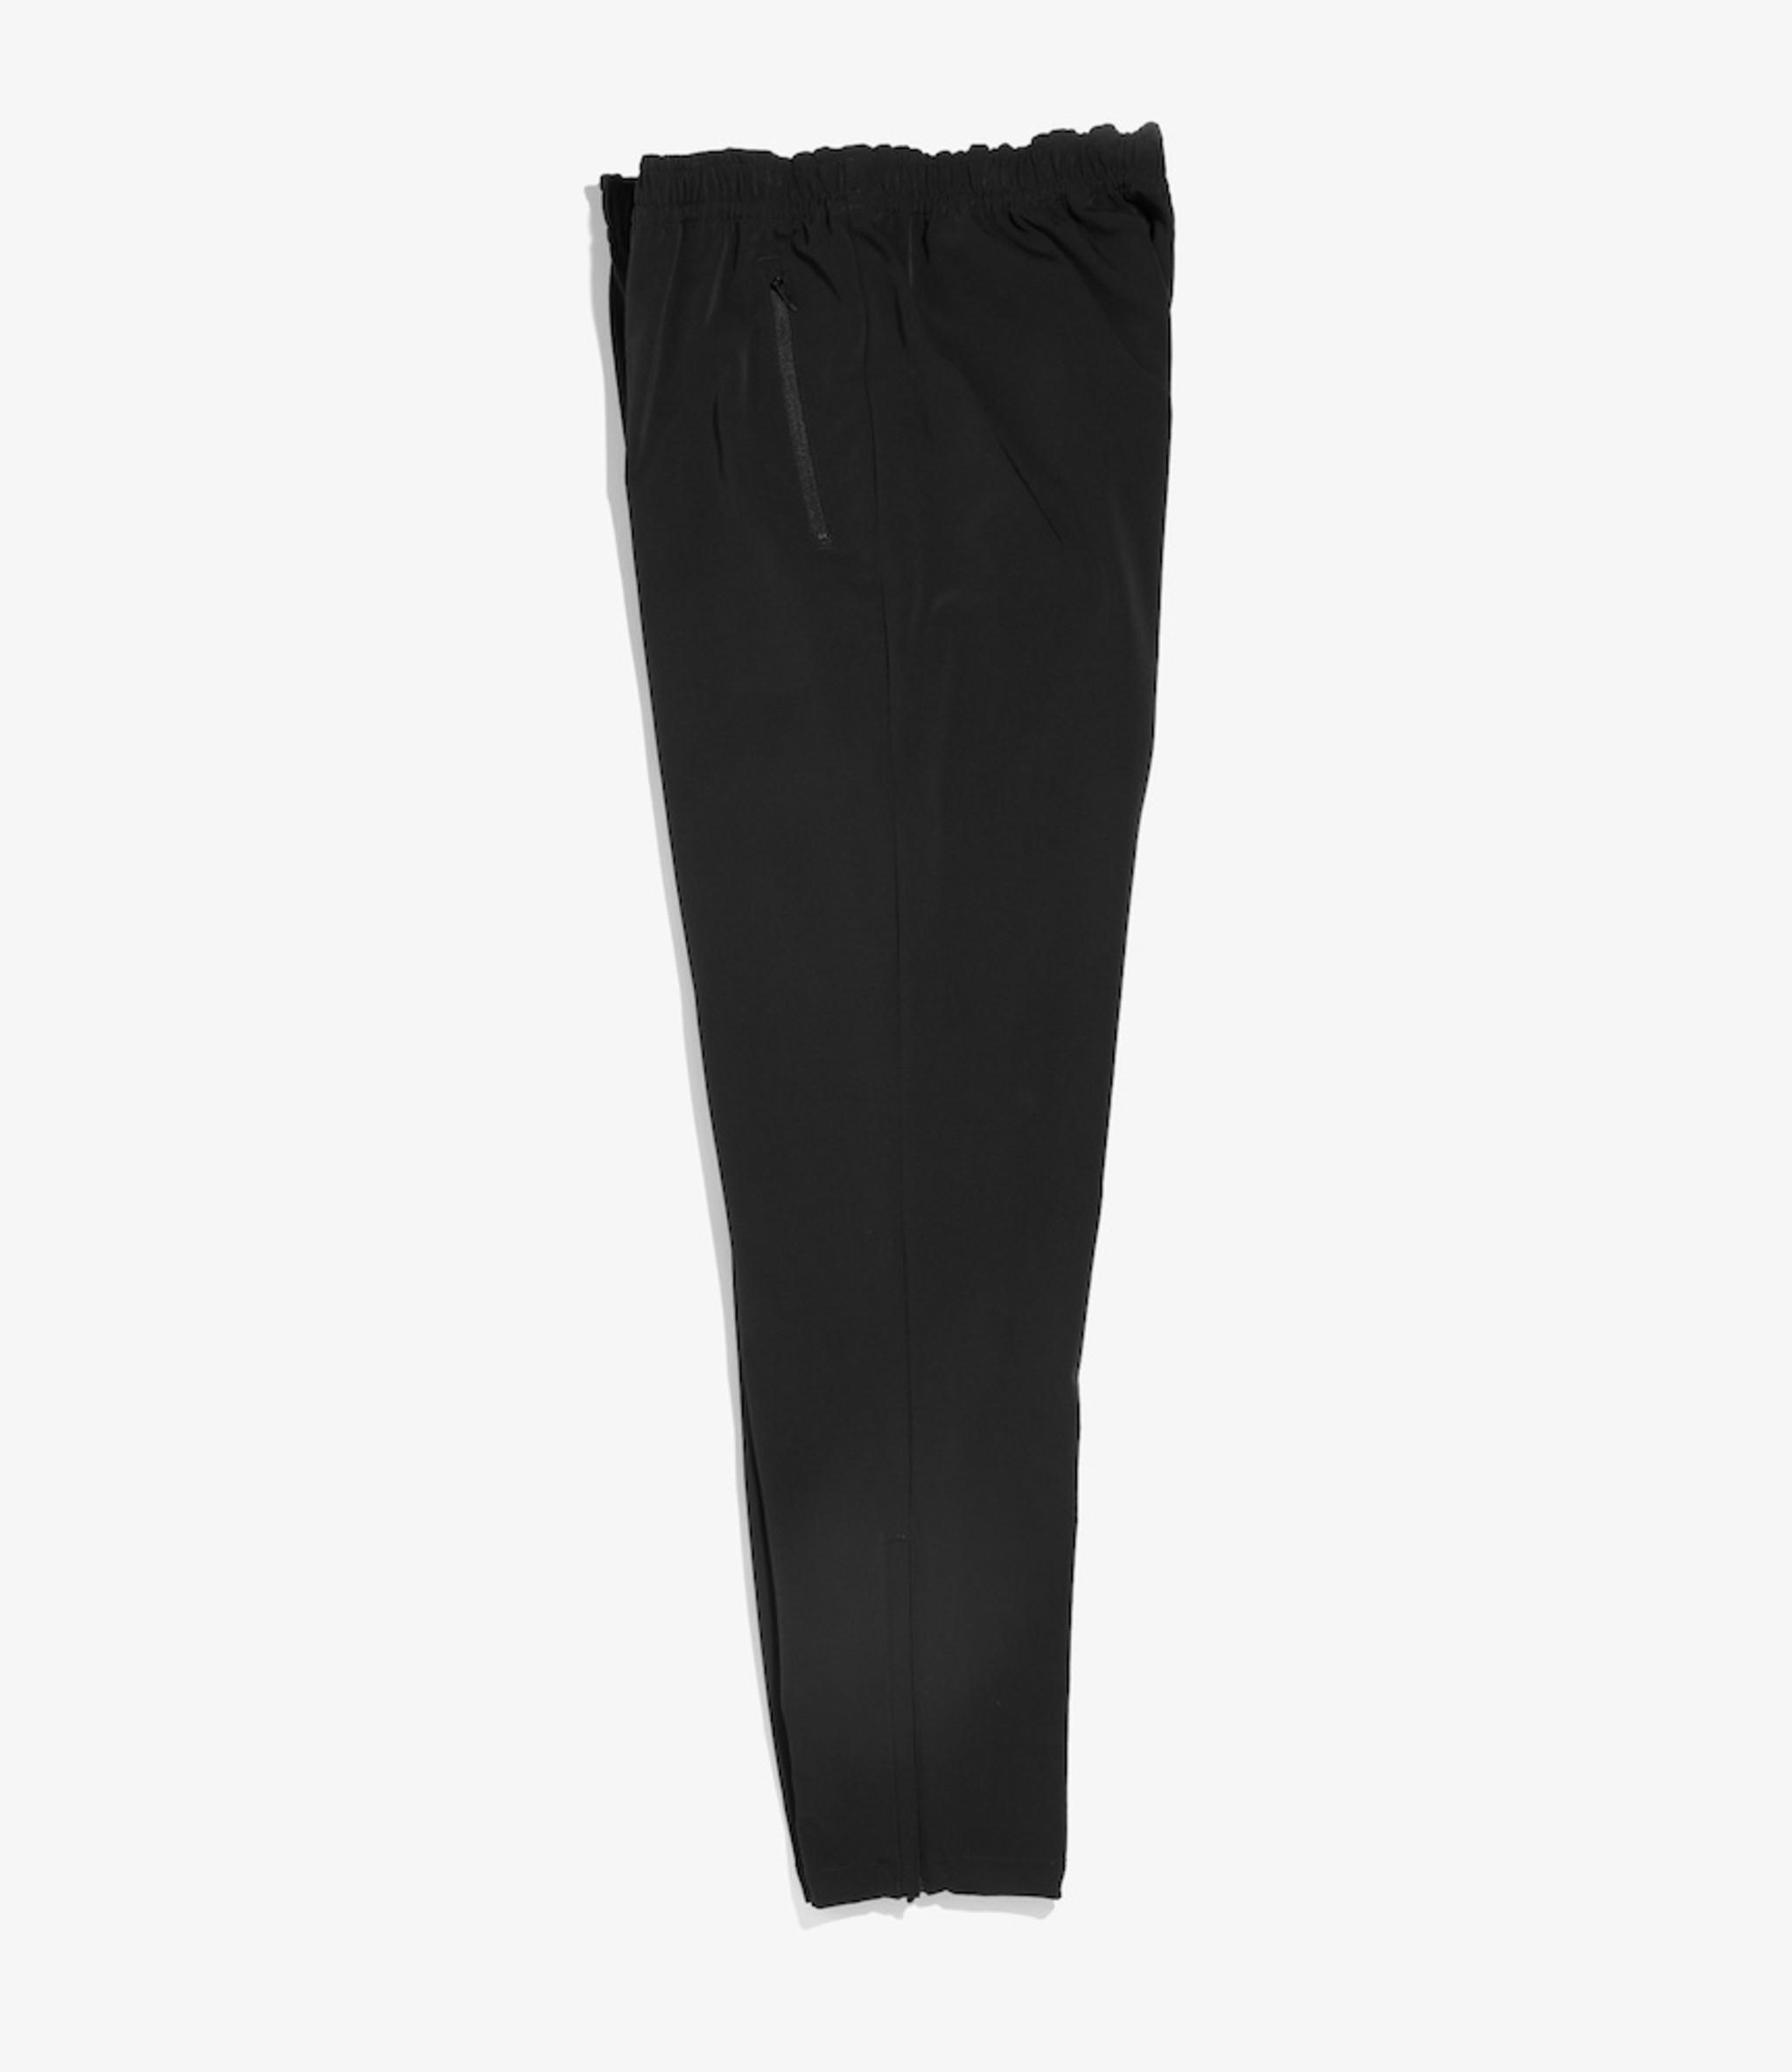 South2 West8 Boulder Pant - Brushed Lining Twill - Black